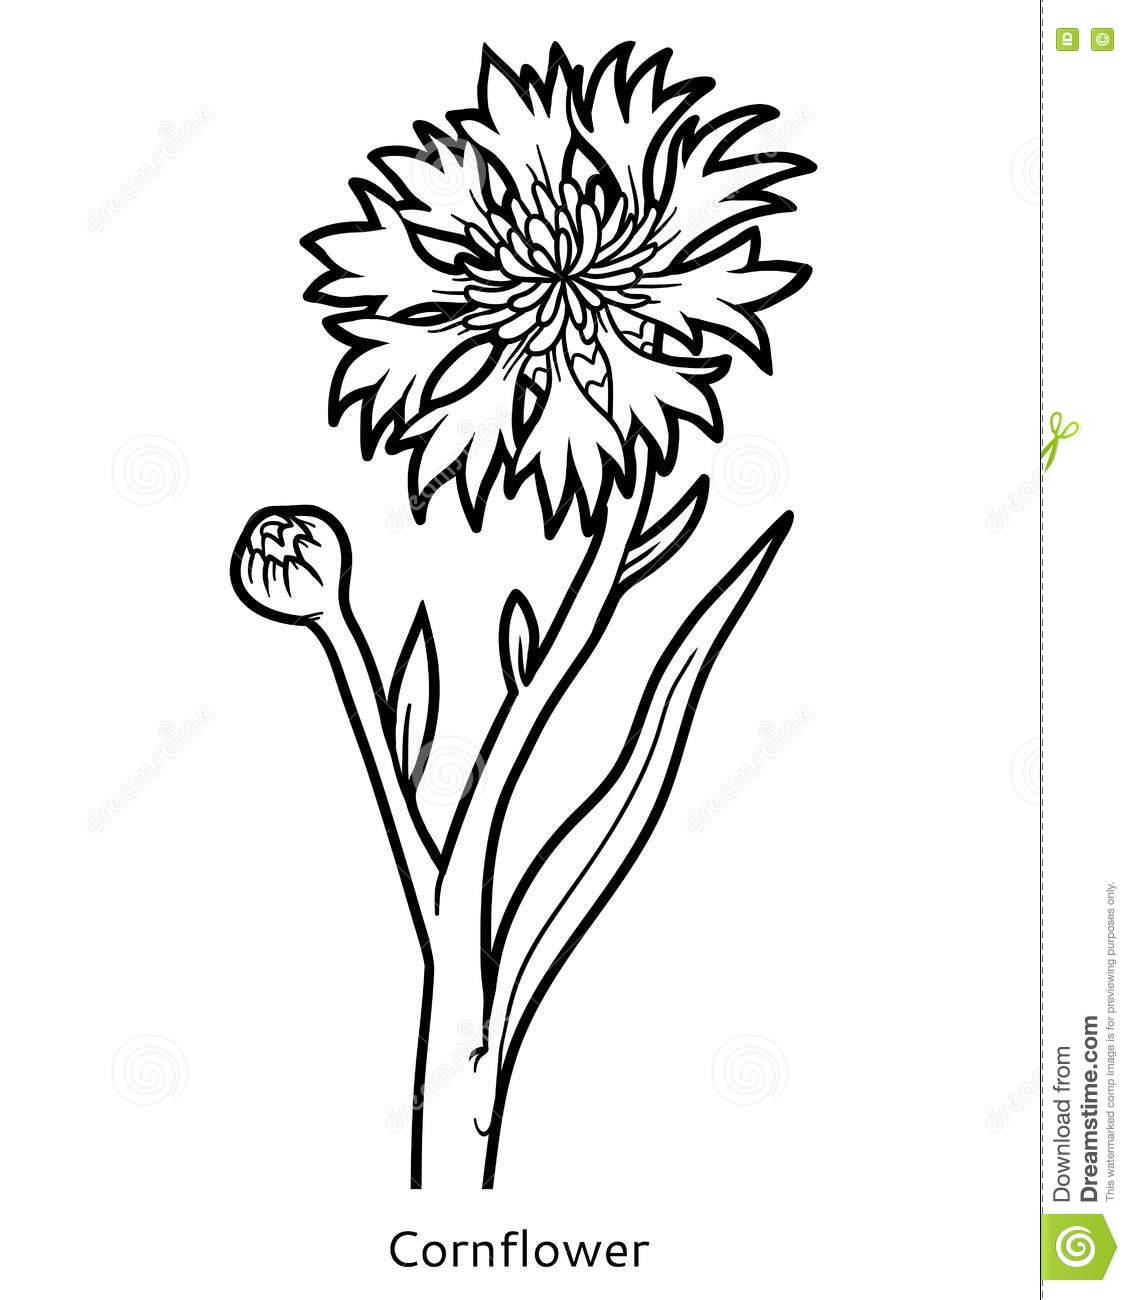 Cornflower coloring #14, Download drawings